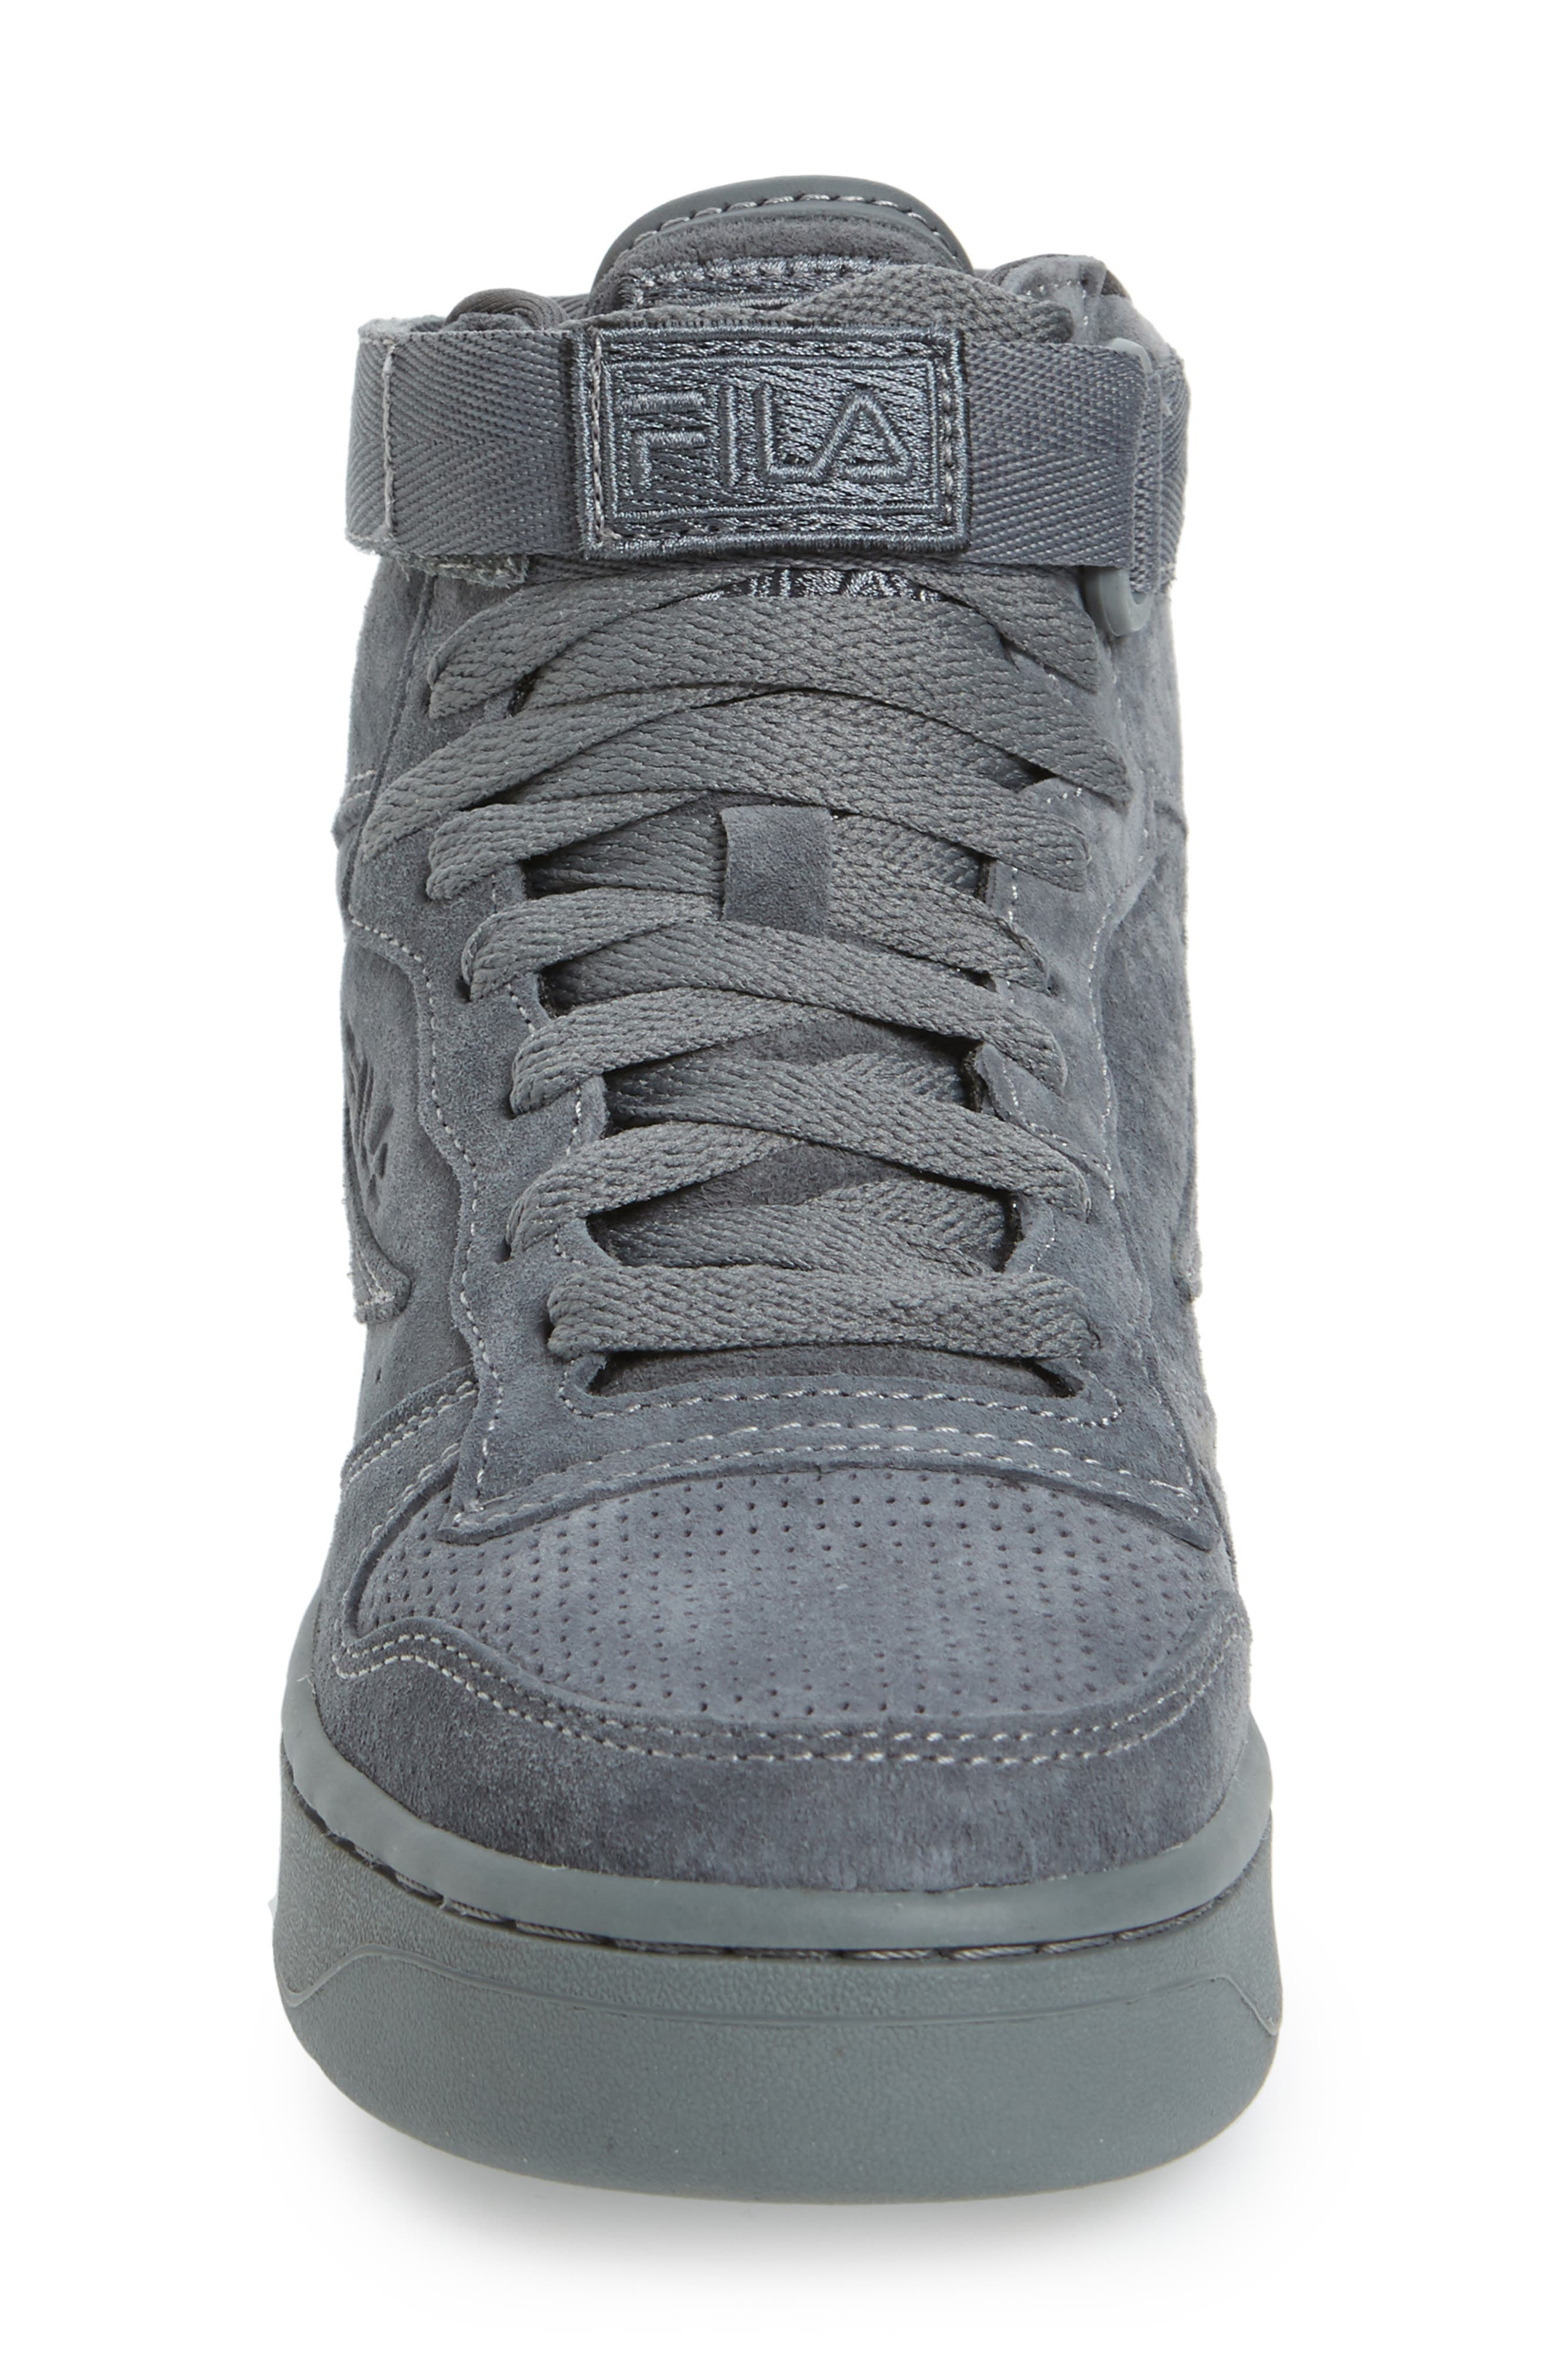 Alternate Image 3  - Fila USA FX-100 High Top Sneaker (Big Kid)